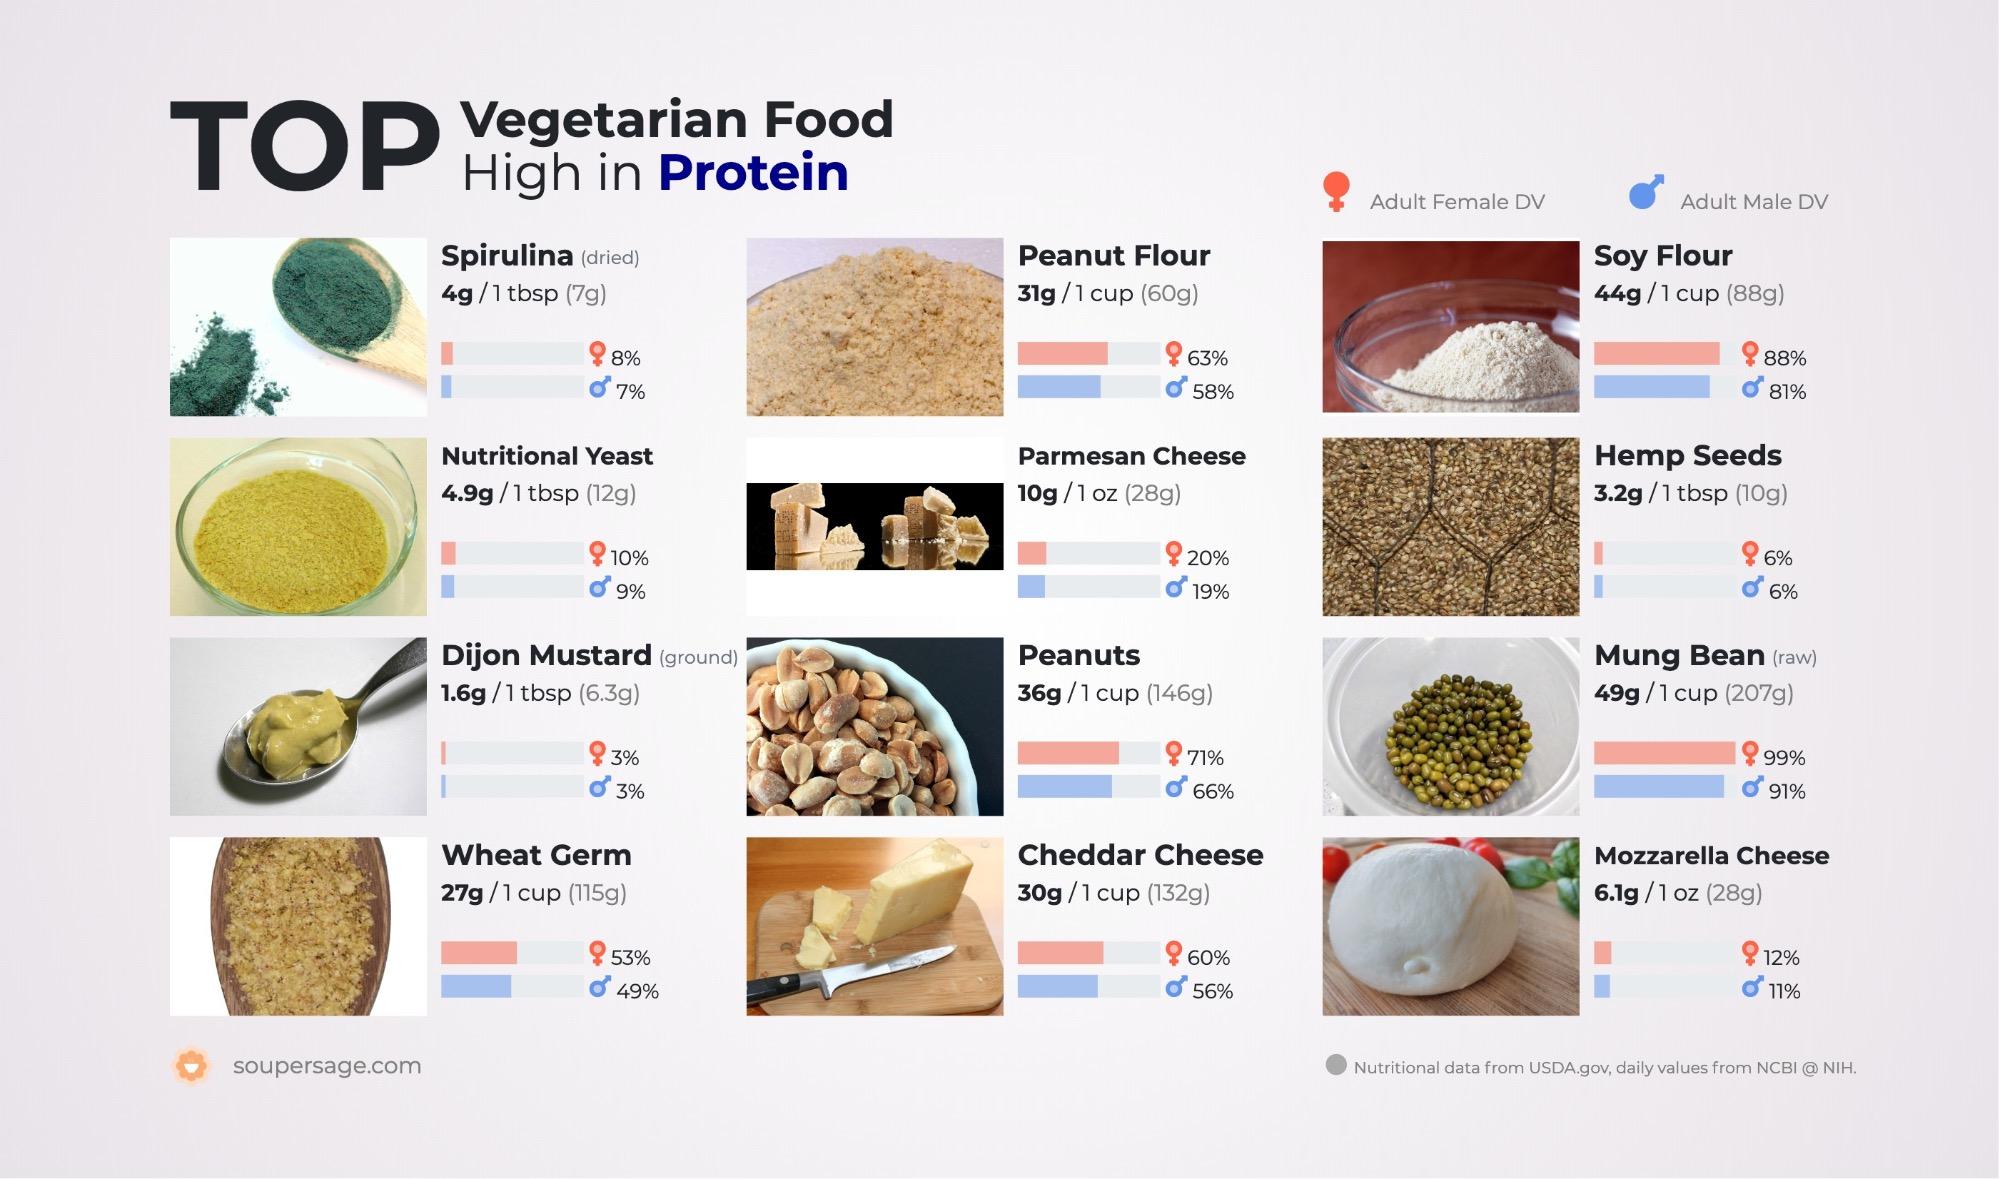 image of Top Vegetarian Food High in Protein